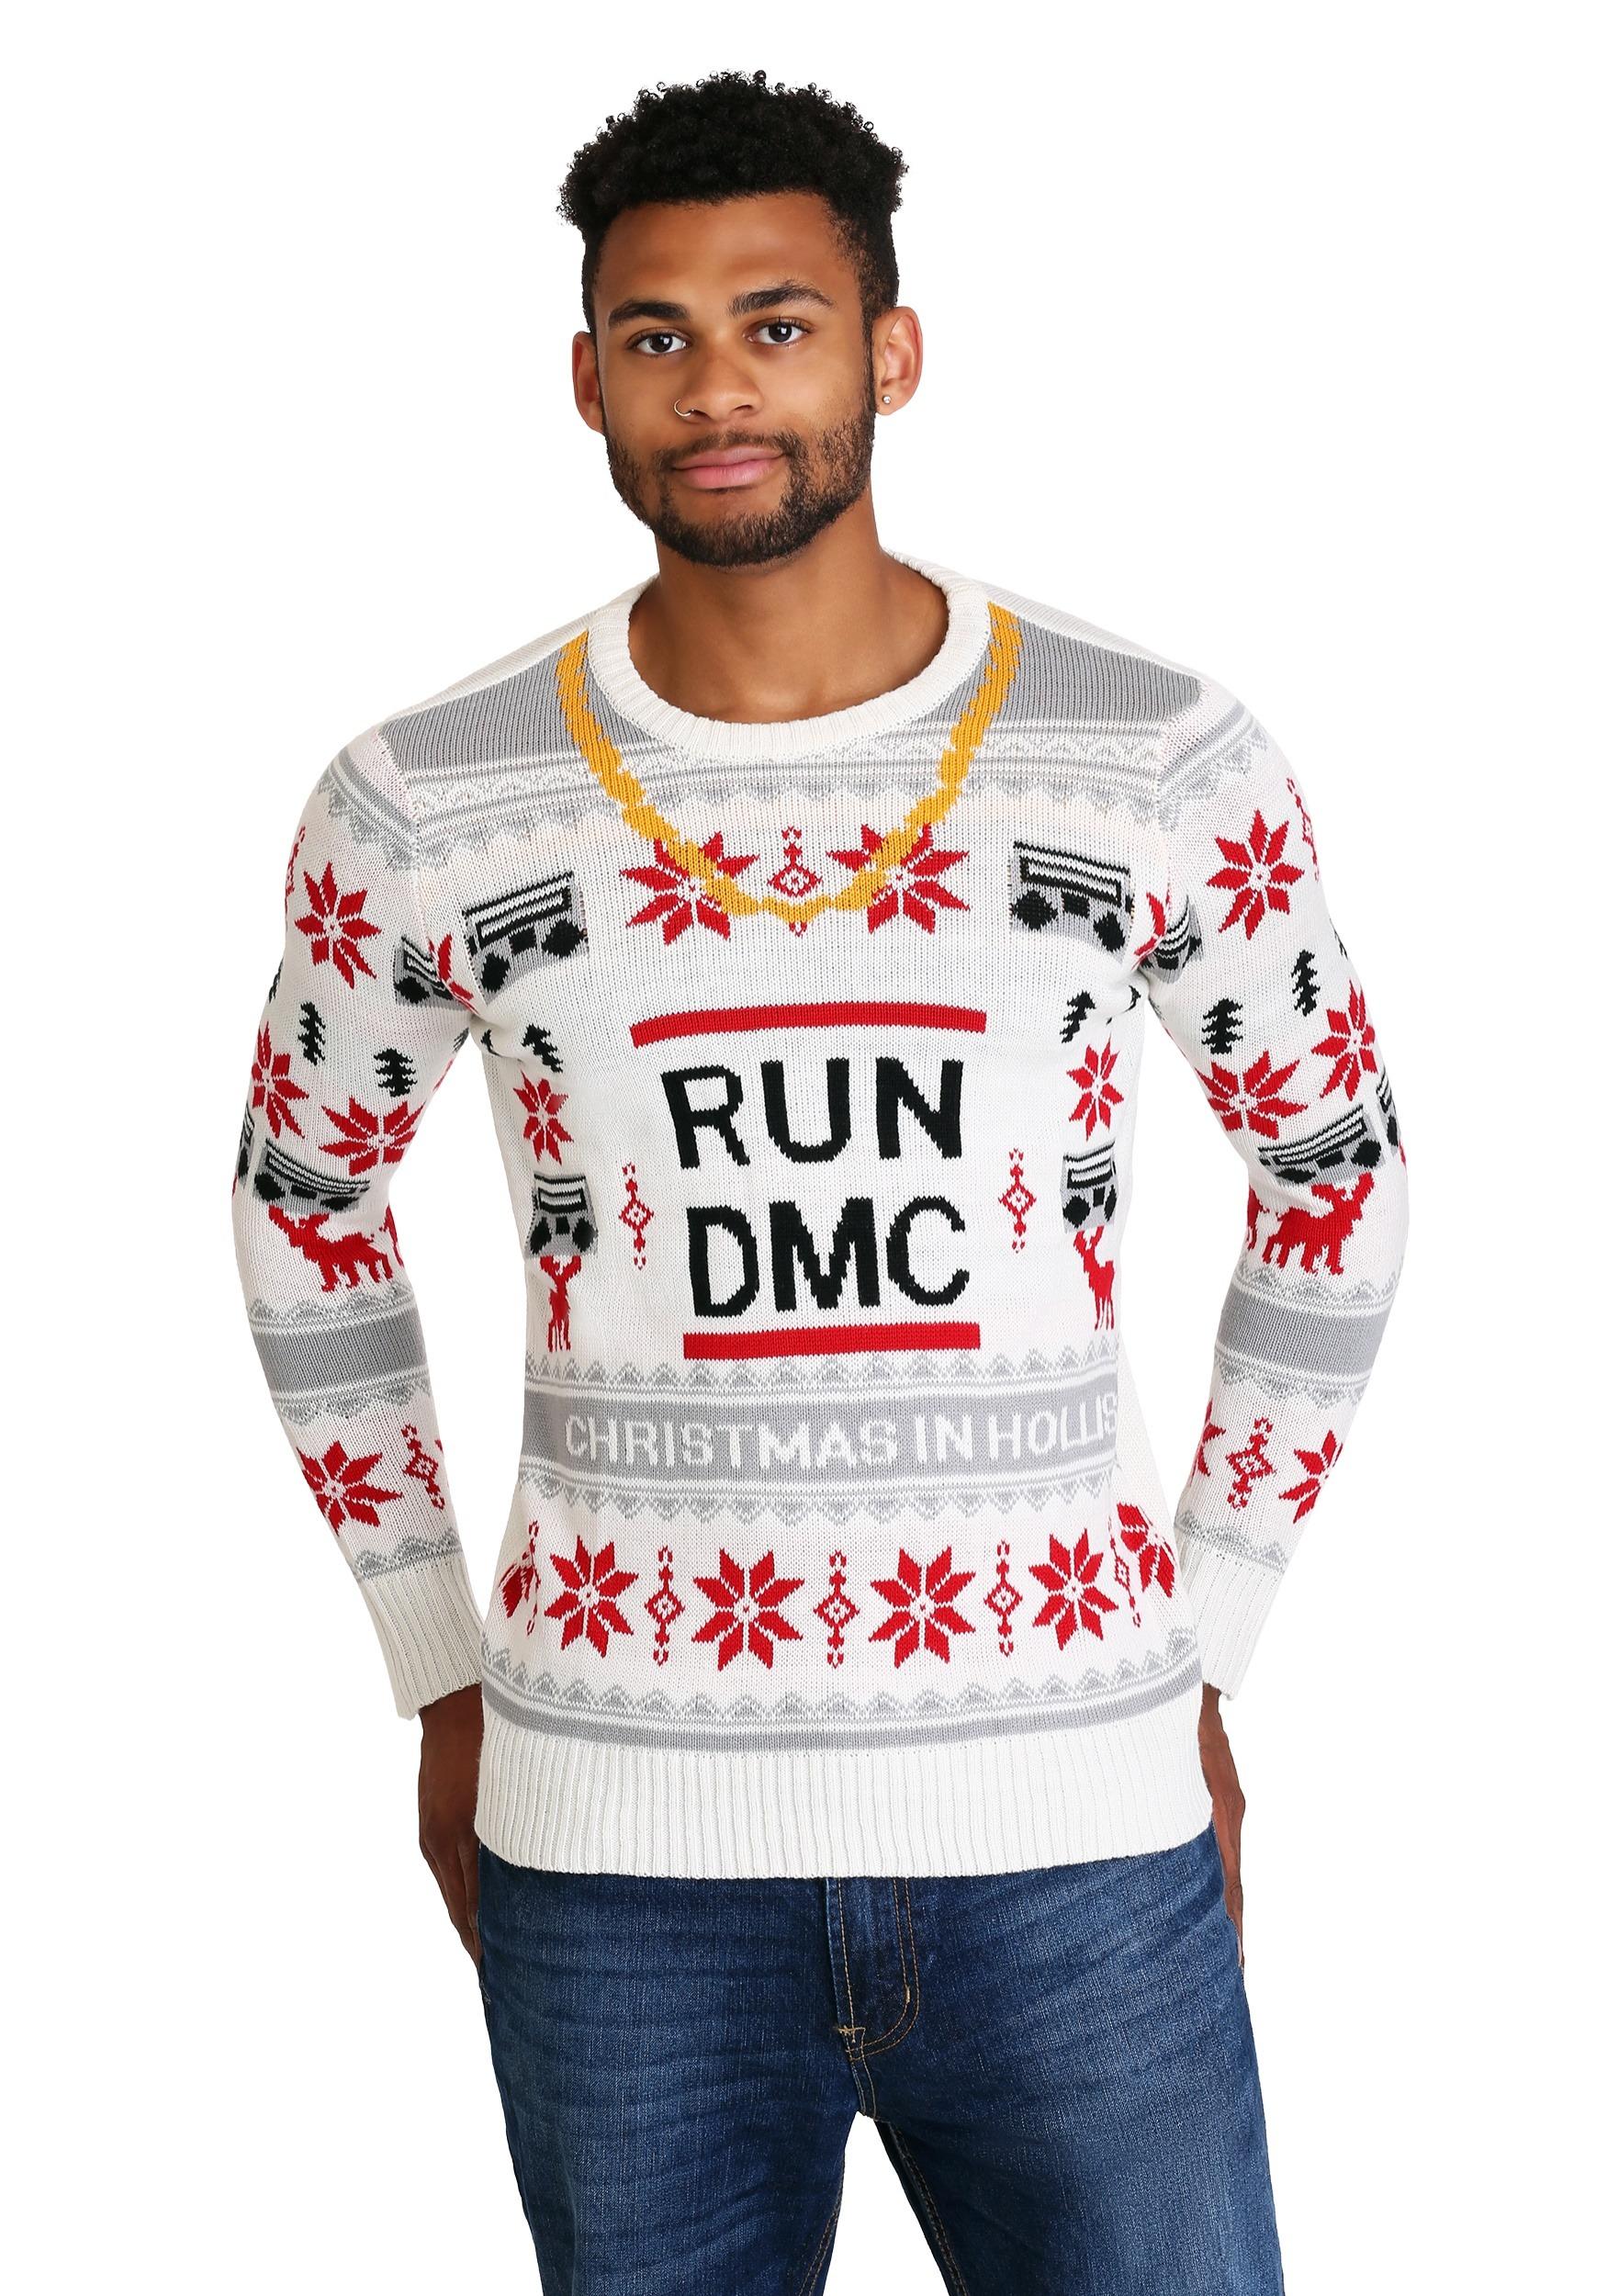 Run Dmc Christmas.Run Dmc Chain Ugly Christmas Sweater